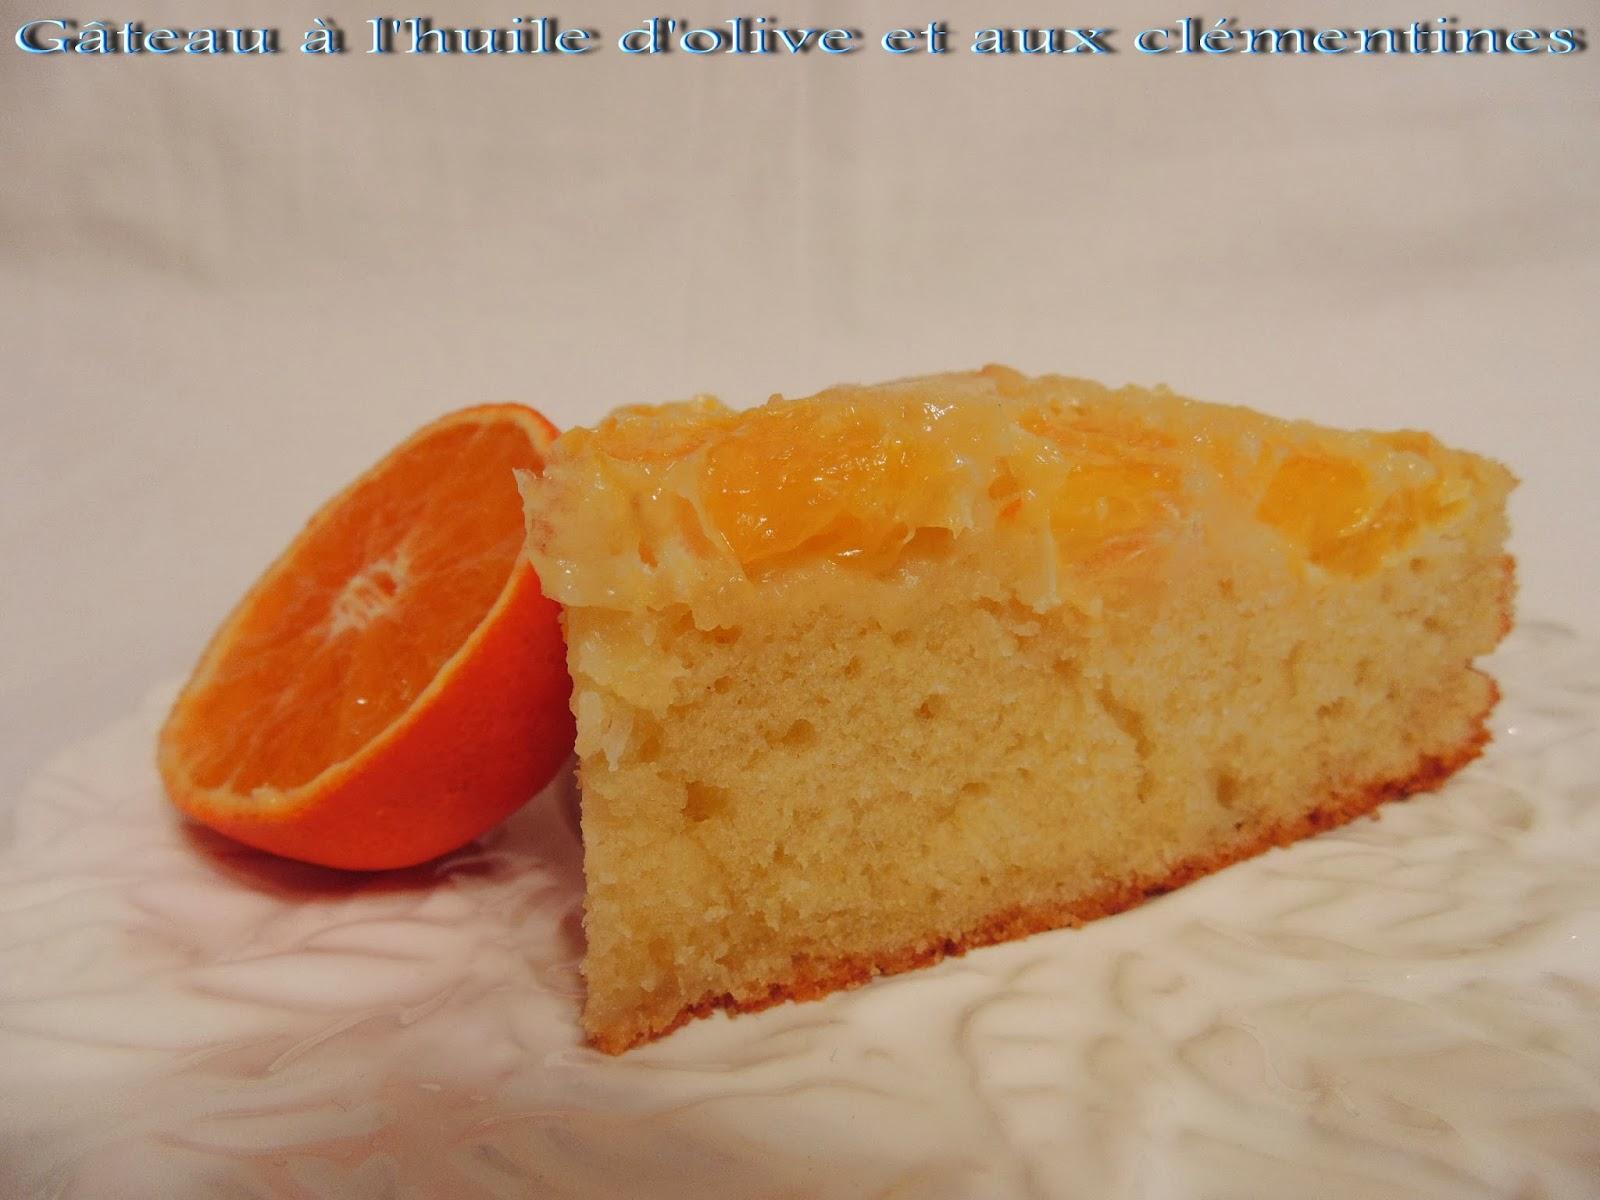 Gateau gaga love cakes gateau l 39 huile d 39 olive et aux cl mentines - Gateau a l huile ...